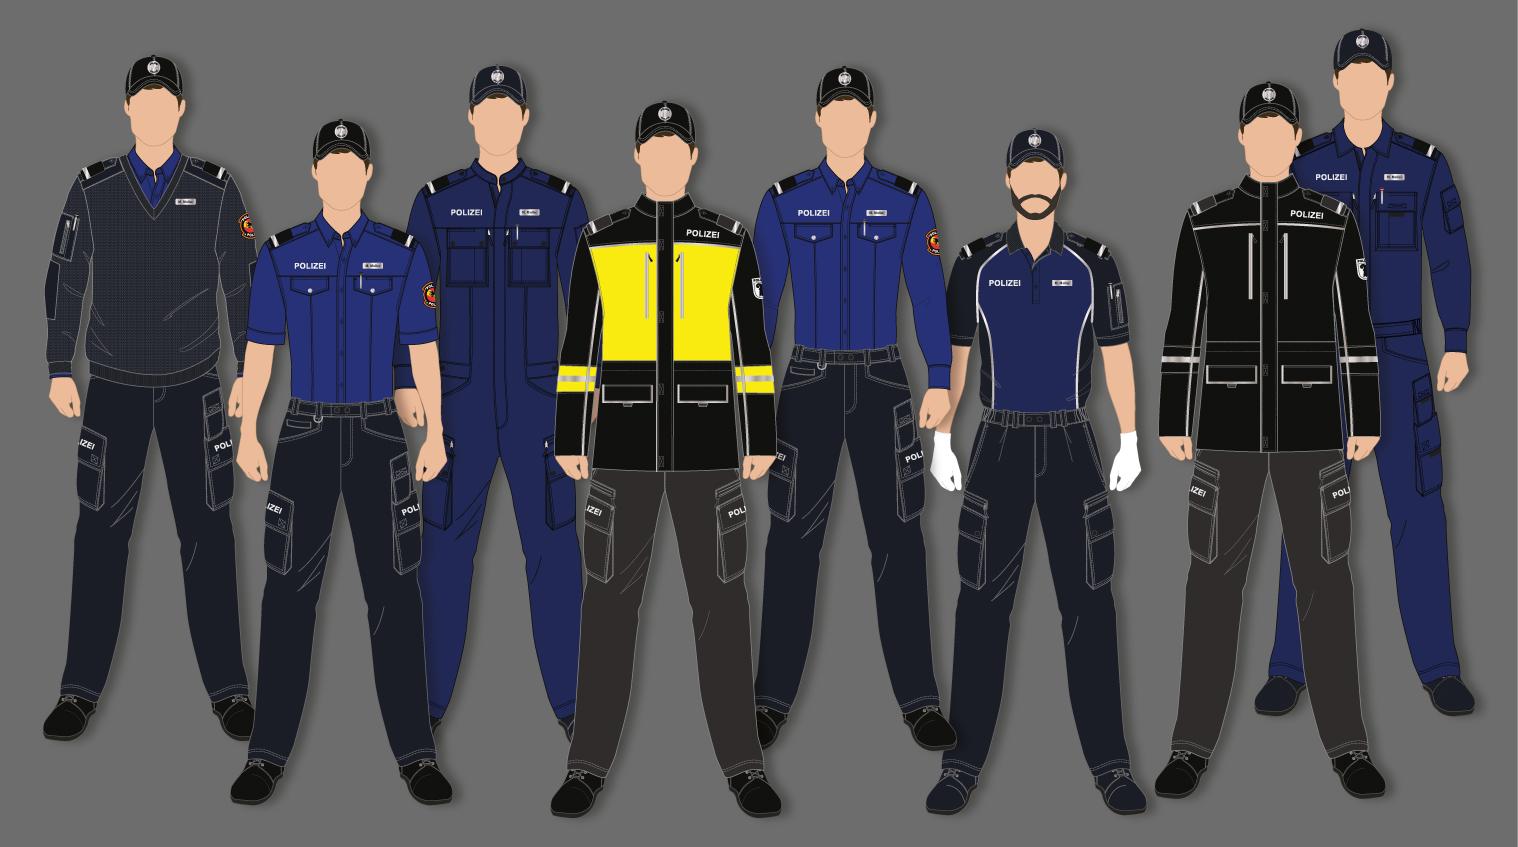 police_officer_uniform_design_decloud-4_1518x847